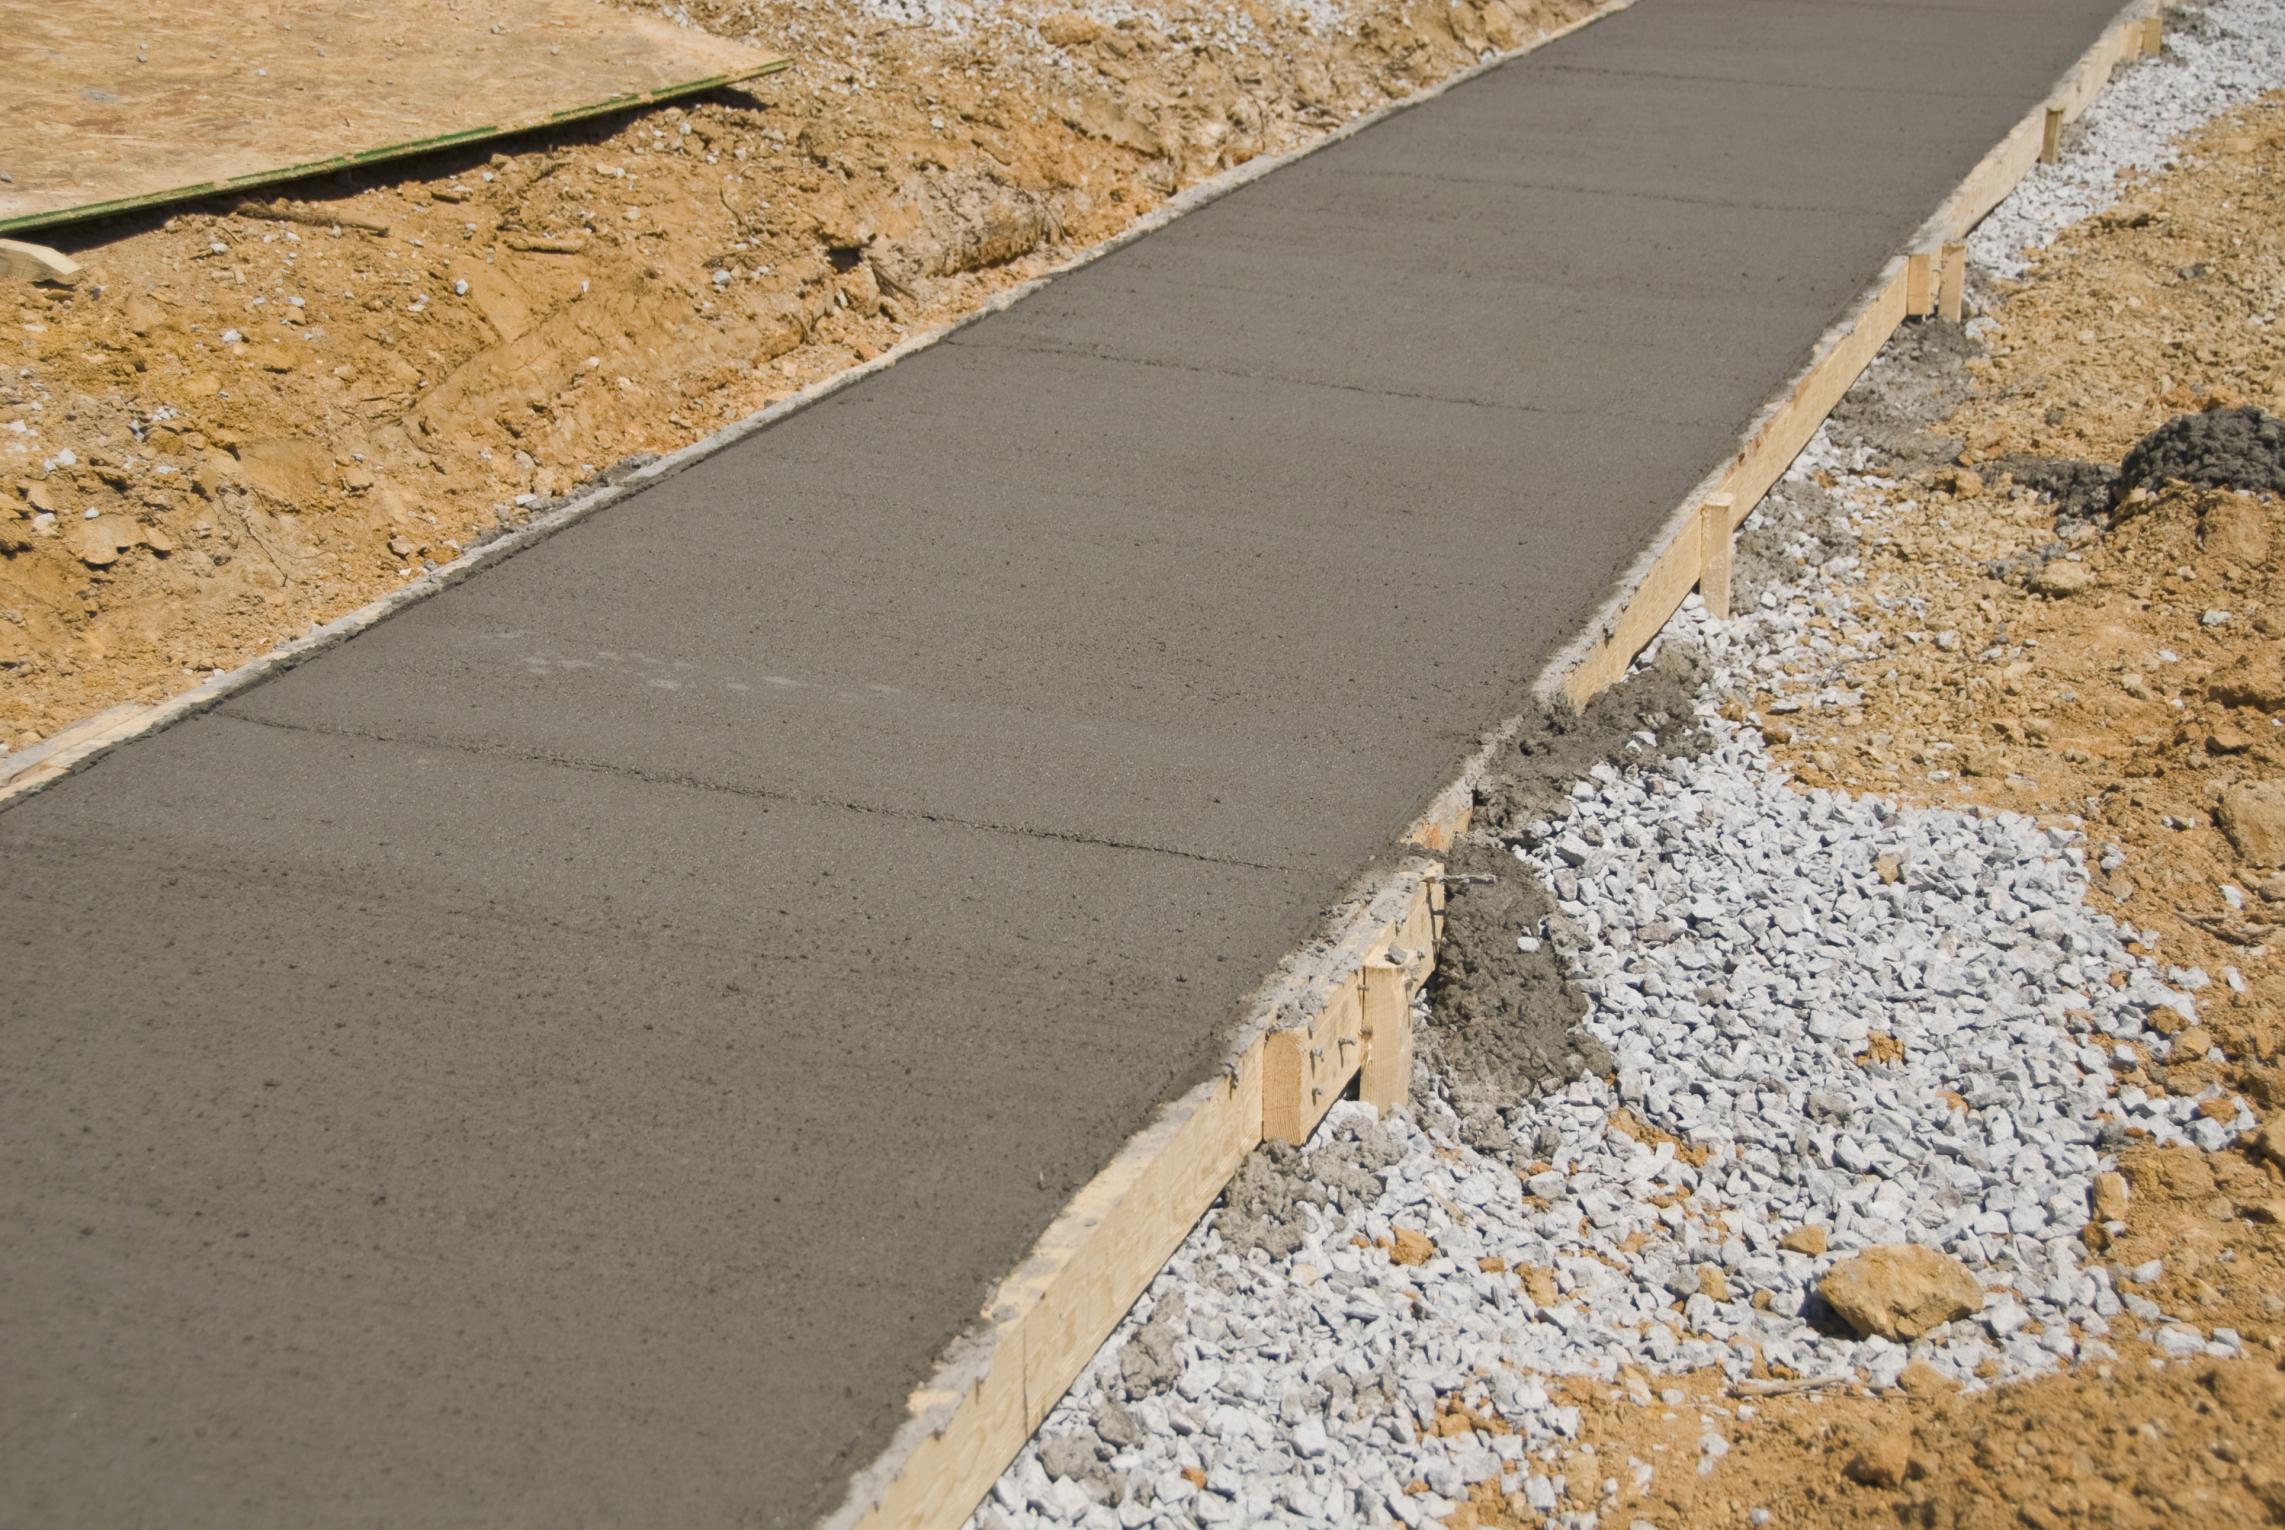 How to Repair a Settling Sidewalk | Garden Guides